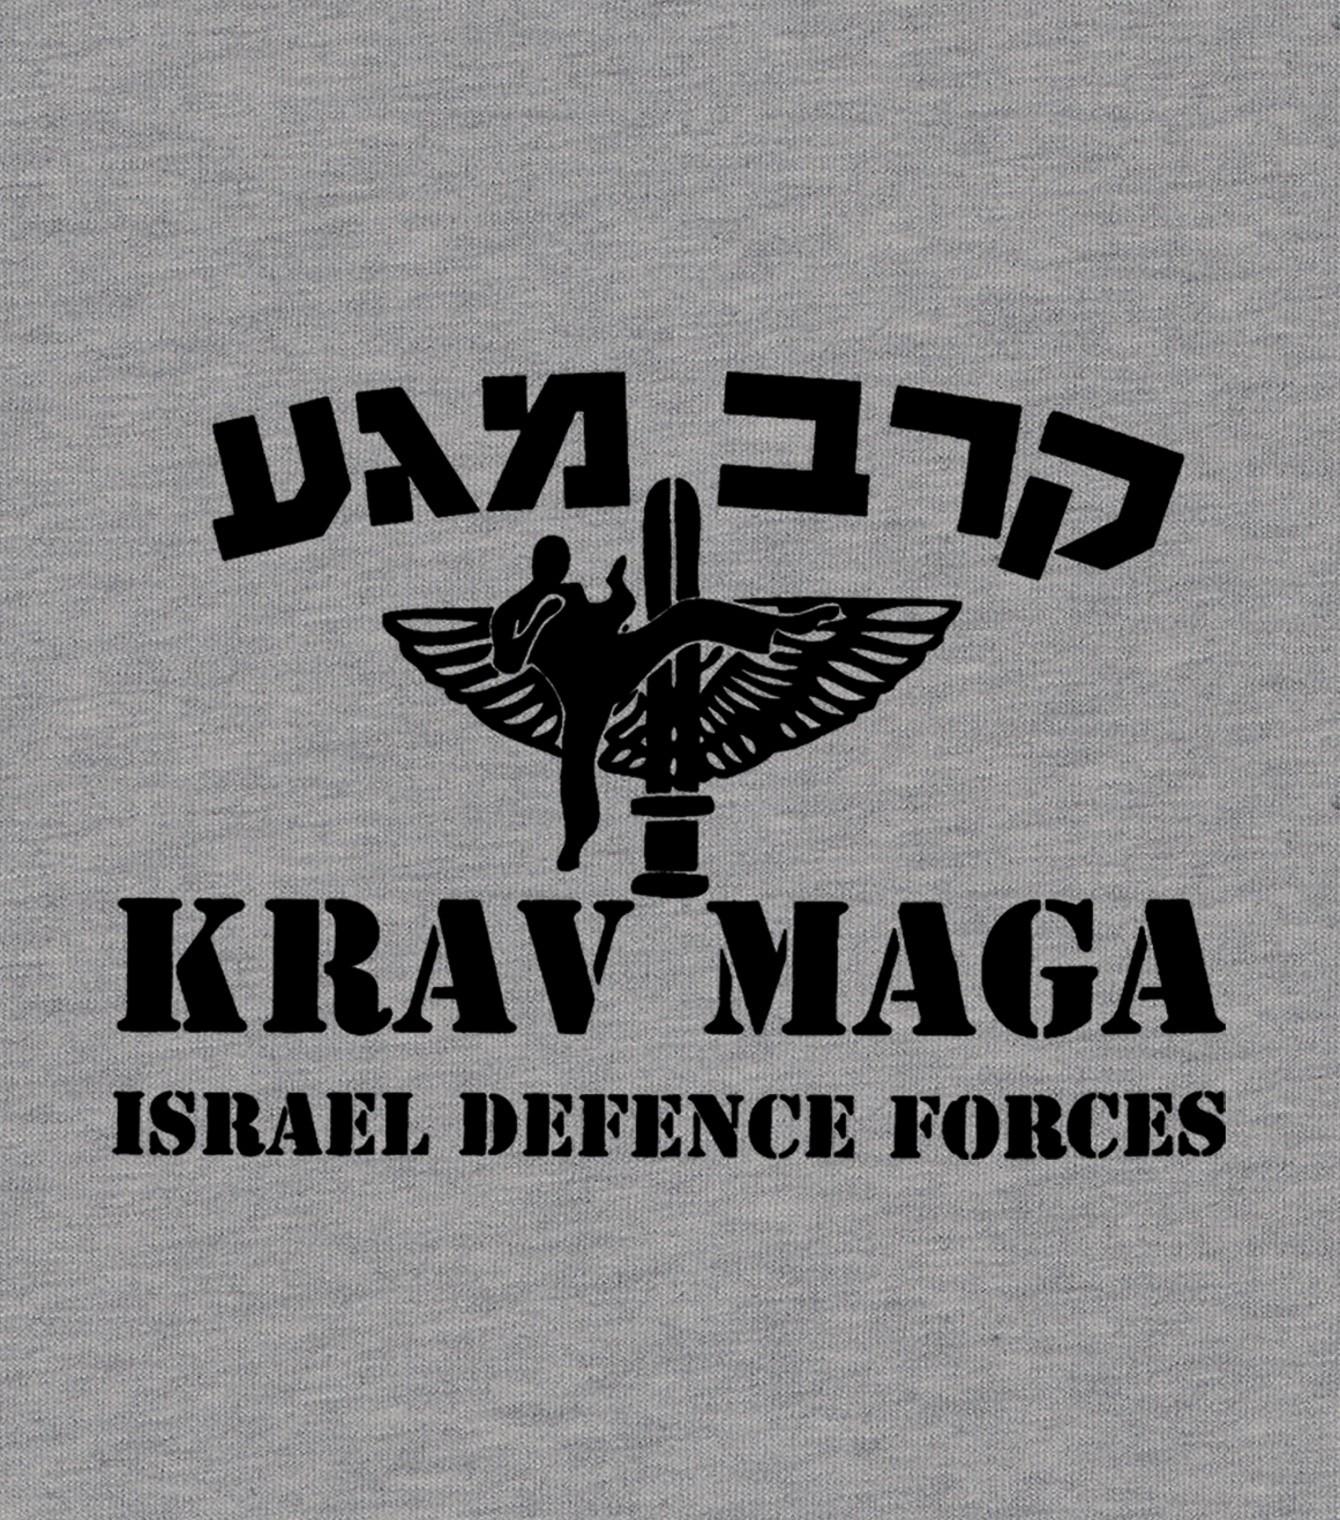 Magaav maga self defense pictures kravzone kravmaga workshop krav maga hebrew buycottarizona